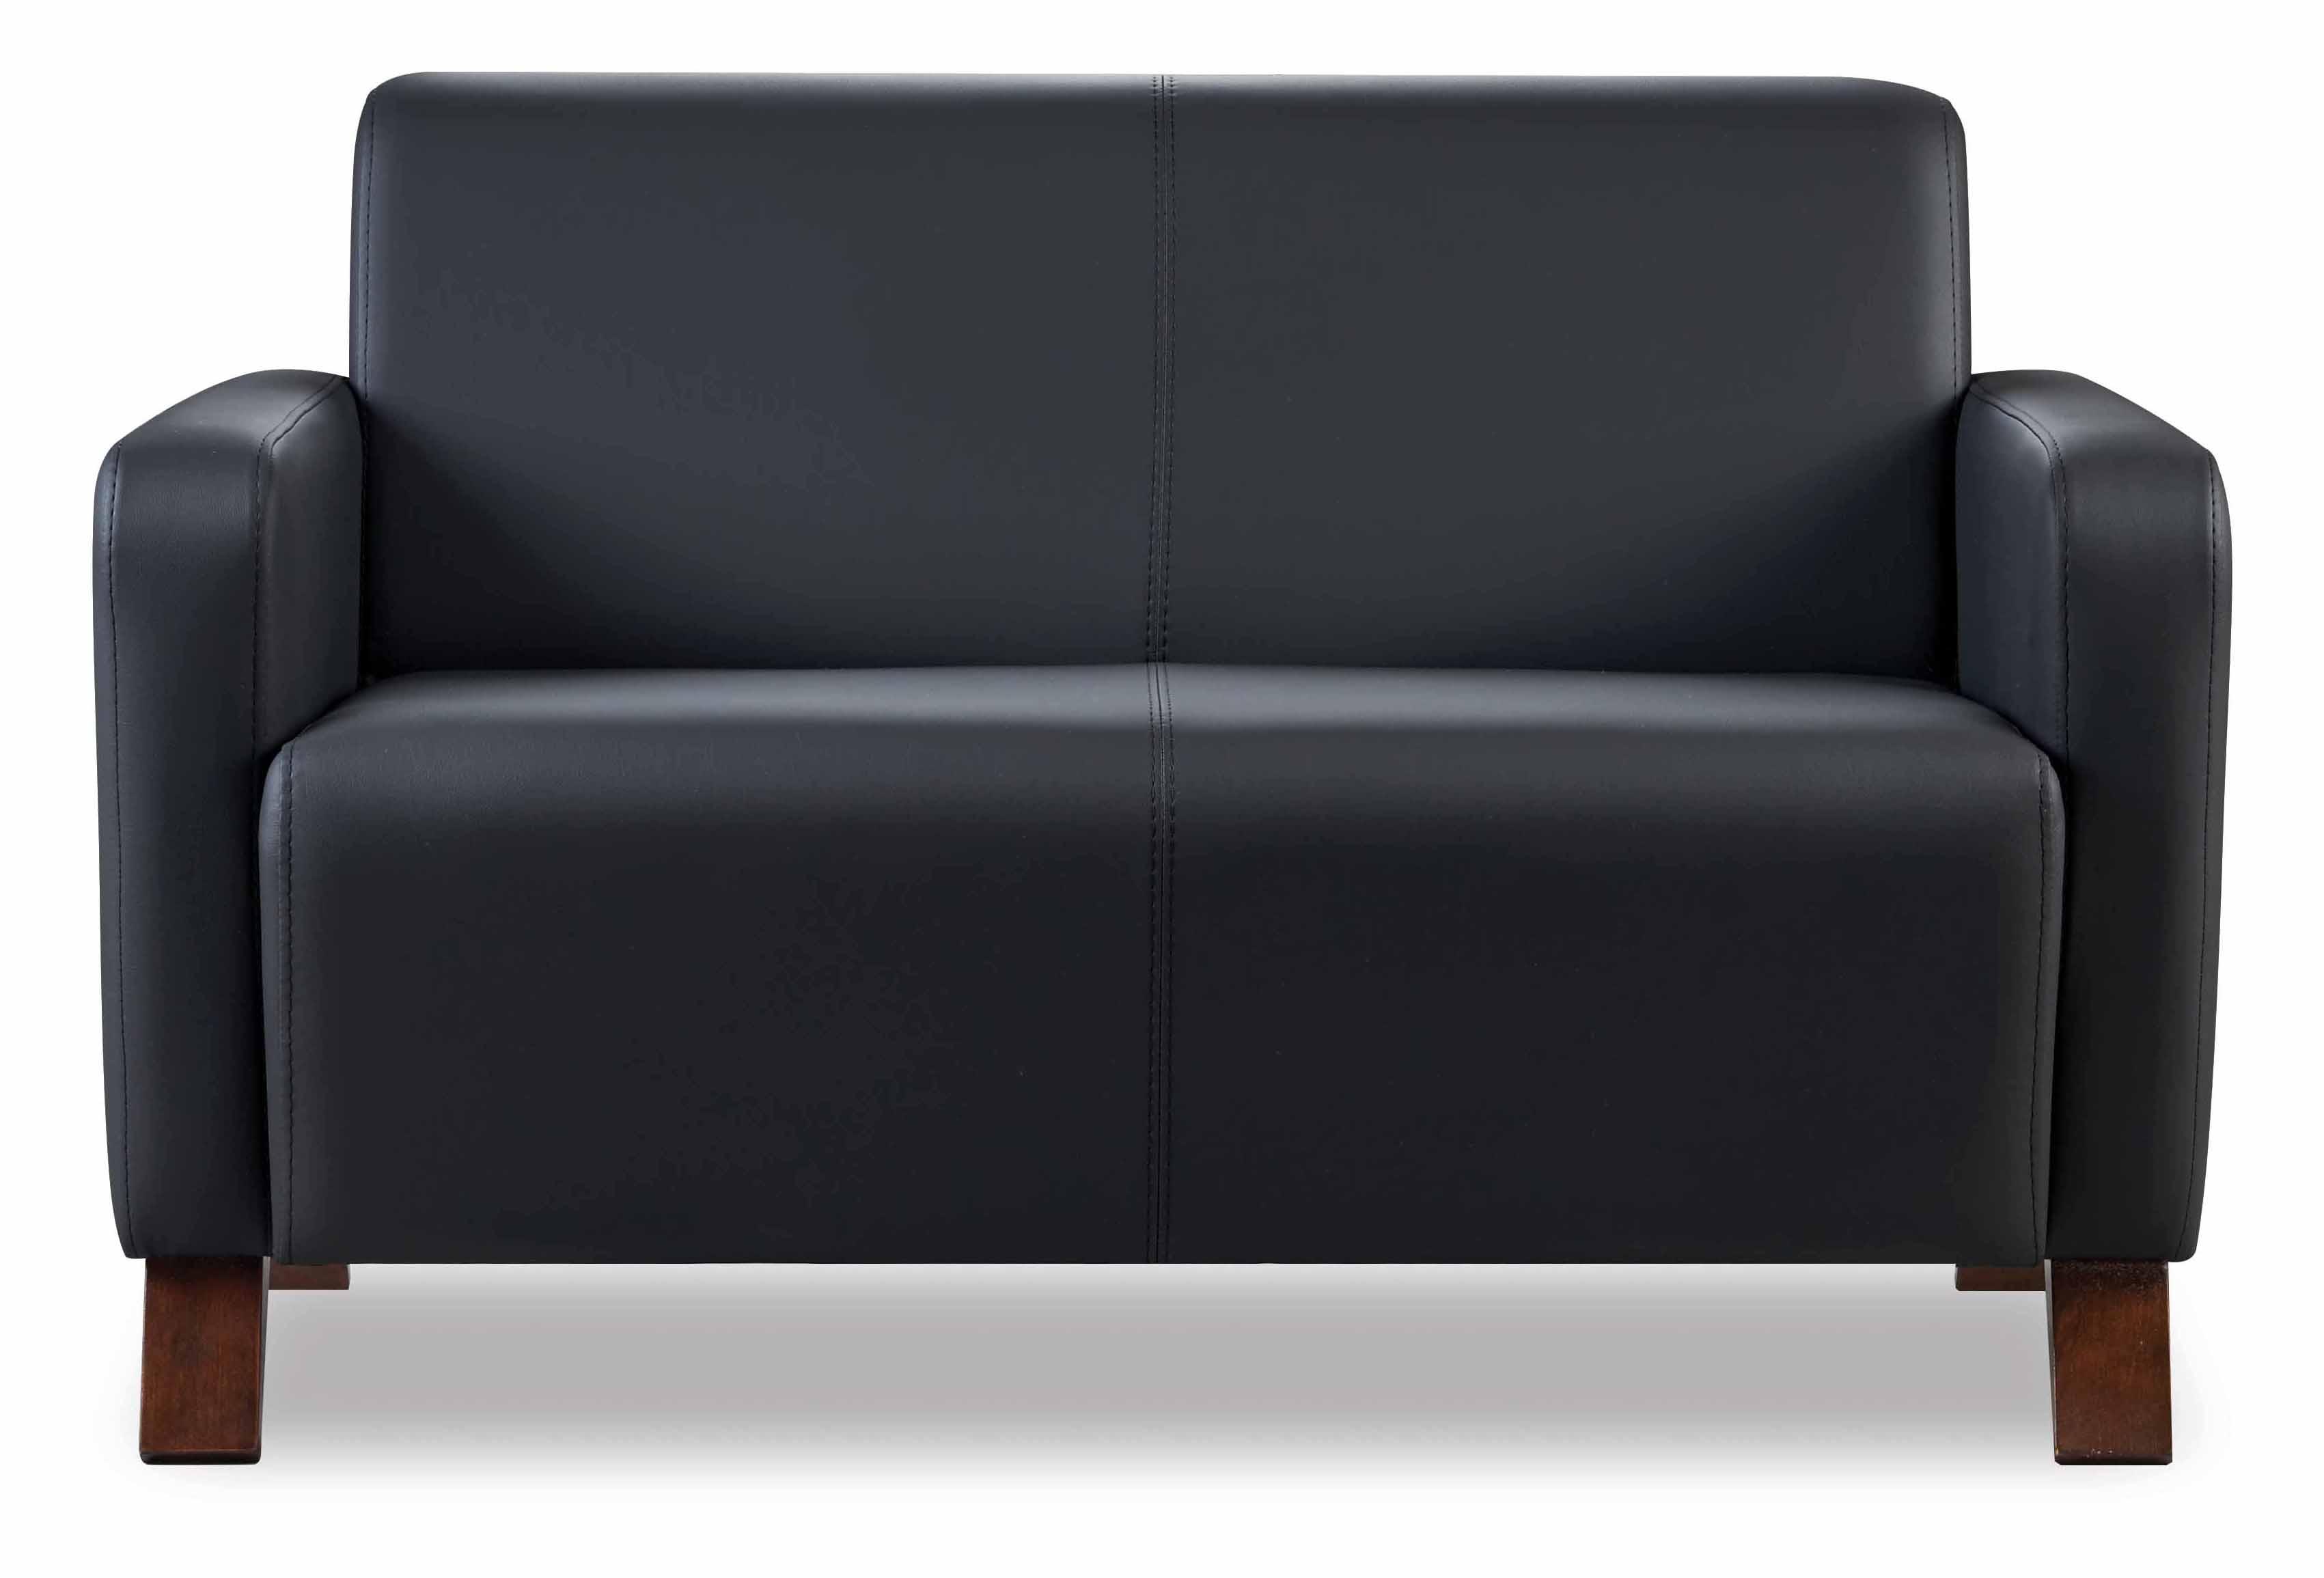 inova lounge sofa 2 sitzer schwarz m bel star. Black Bedroom Furniture Sets. Home Design Ideas